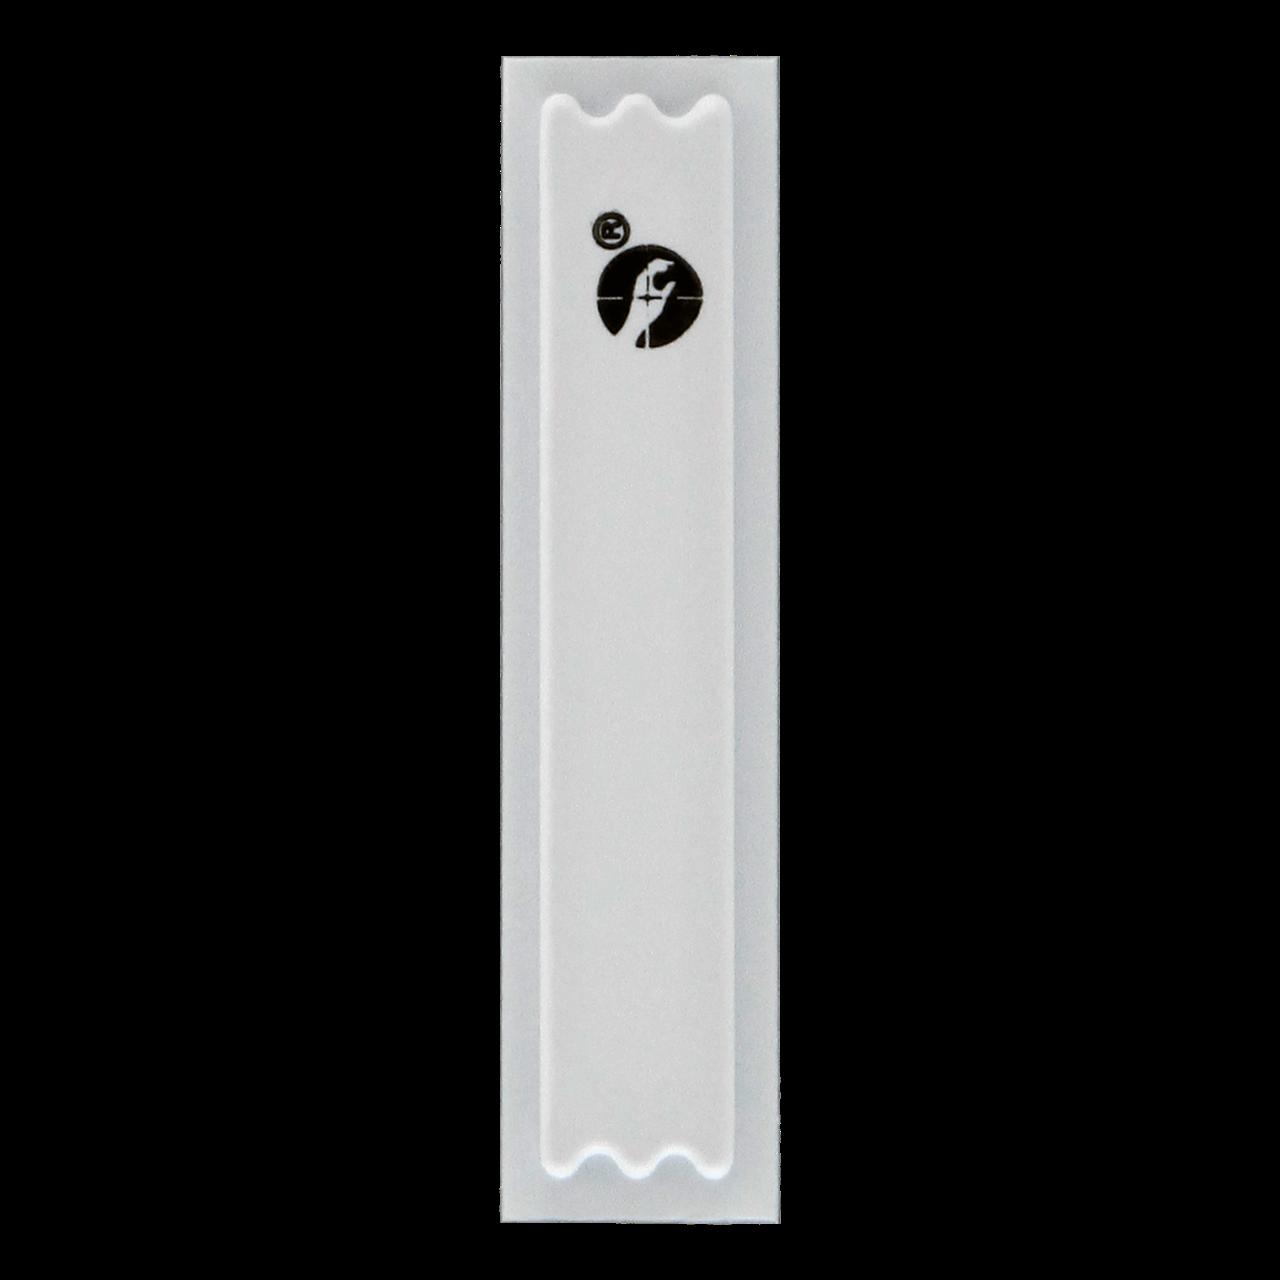 Sensormatic Ultra•Strip III Roll Label in Armenia, Vantag LLC